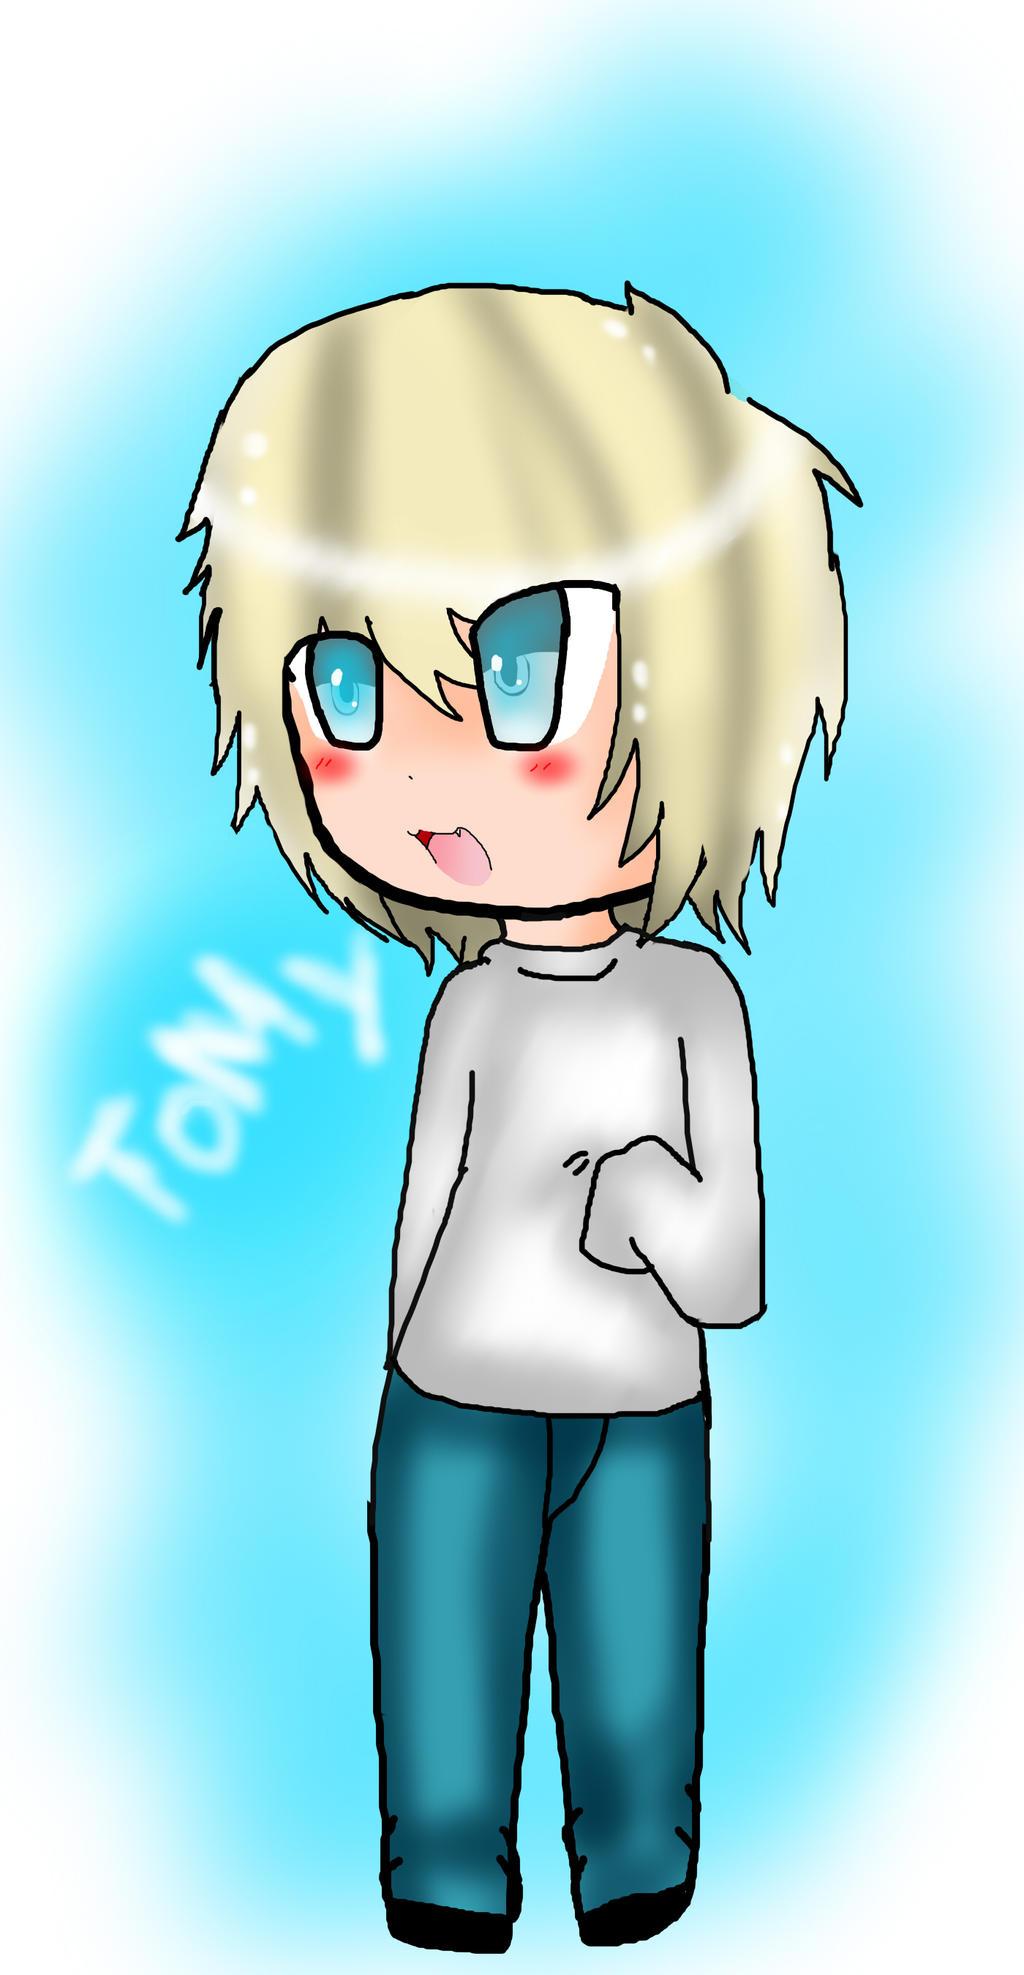 tomy by Invaderdaniela